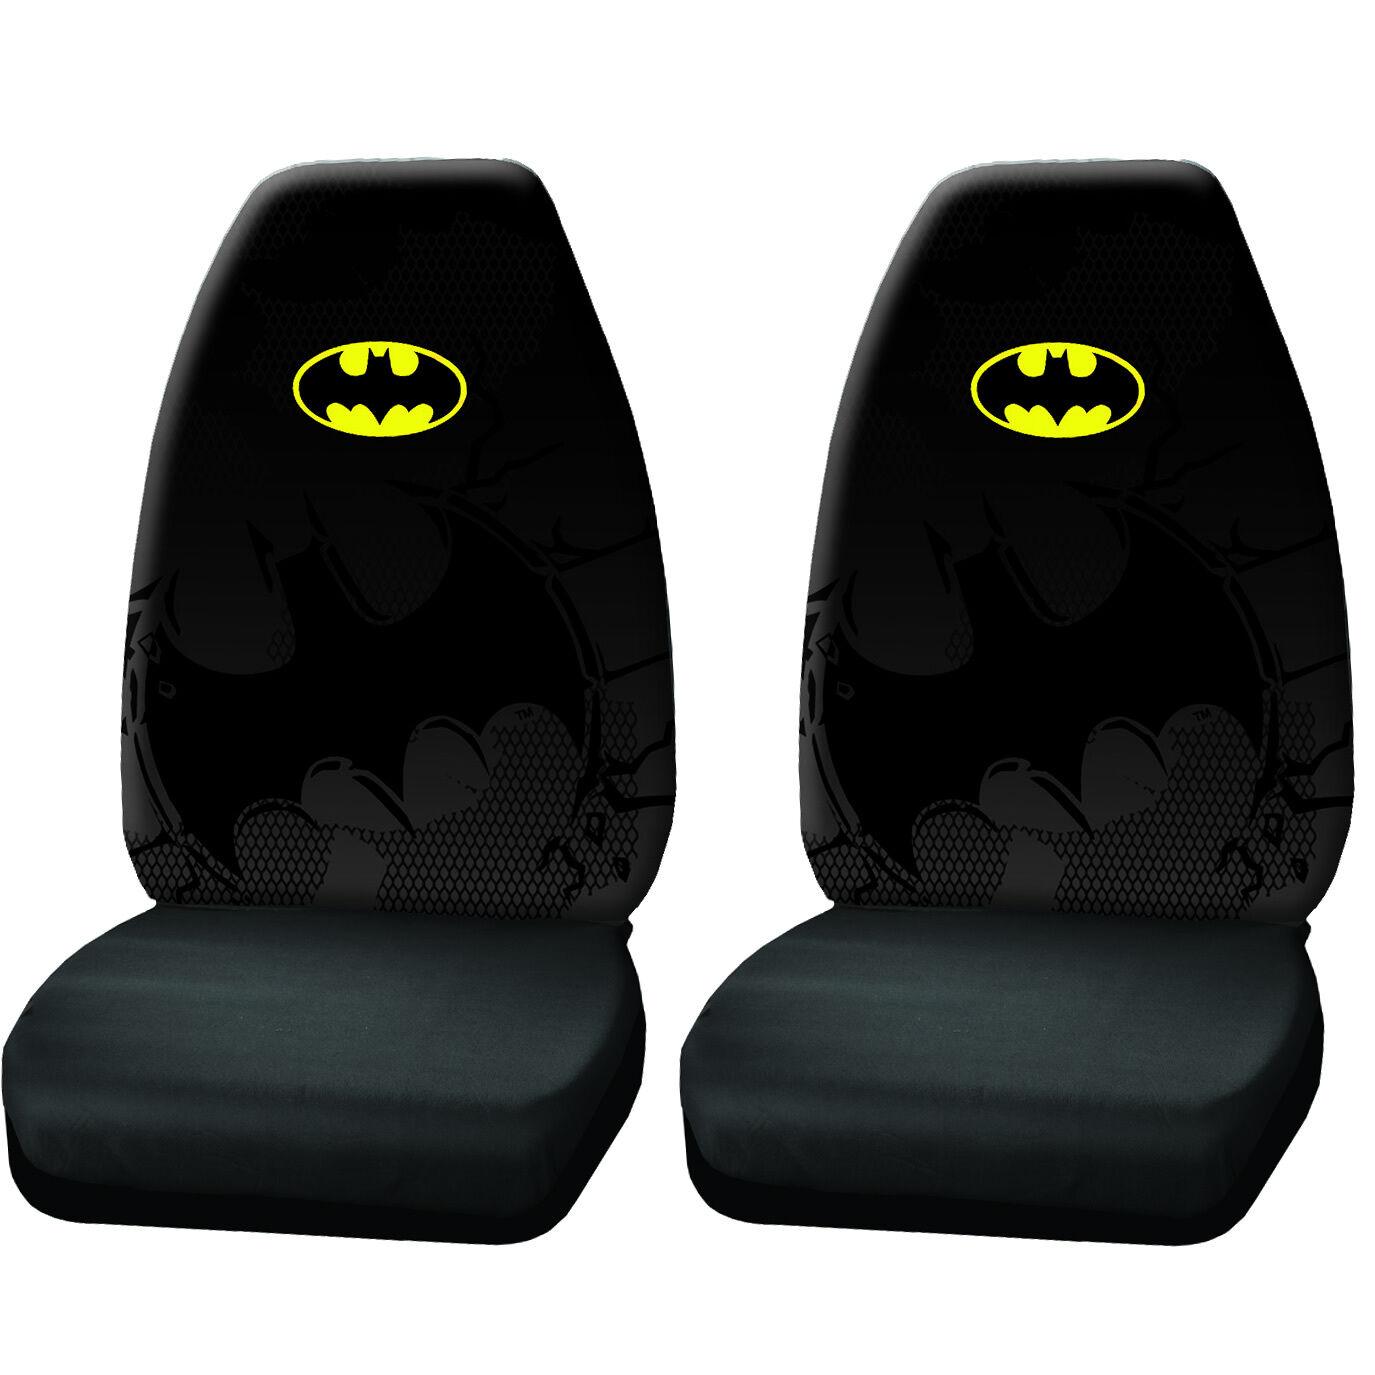 2PC New Batman Shattered DC Comic Black w//Logo Front Seat Covers Universal